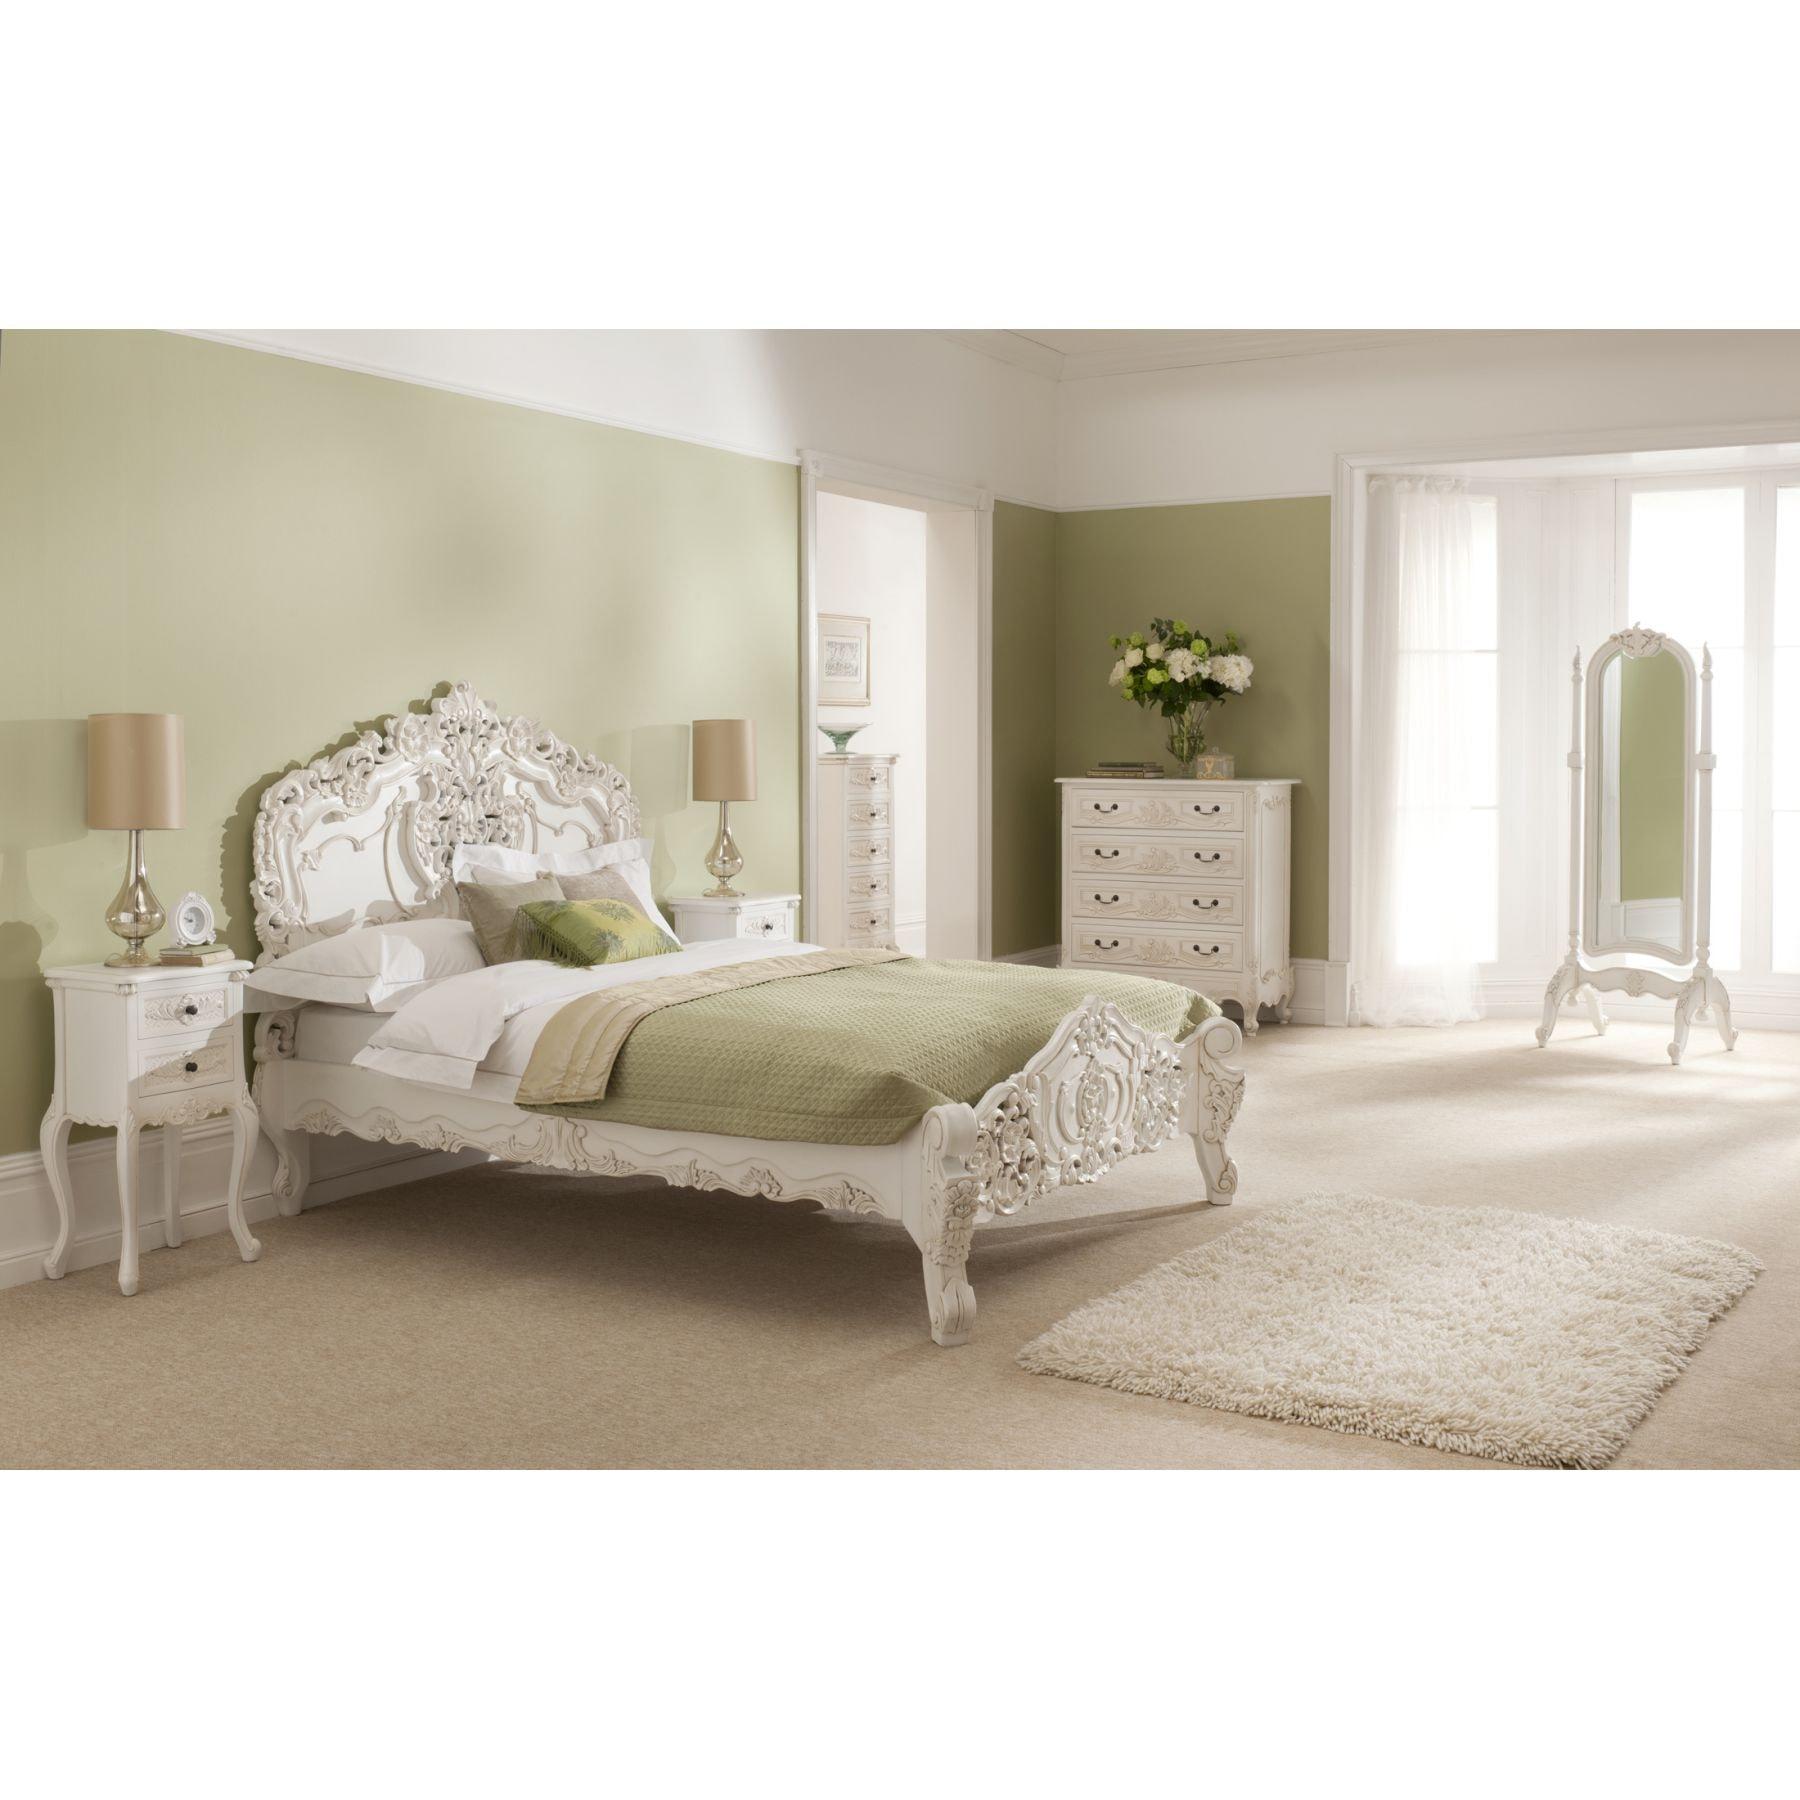 shabby chic furniture bedroom. Rococo Shabby Chic Antique Style Bedside Table Furniture Bedroom